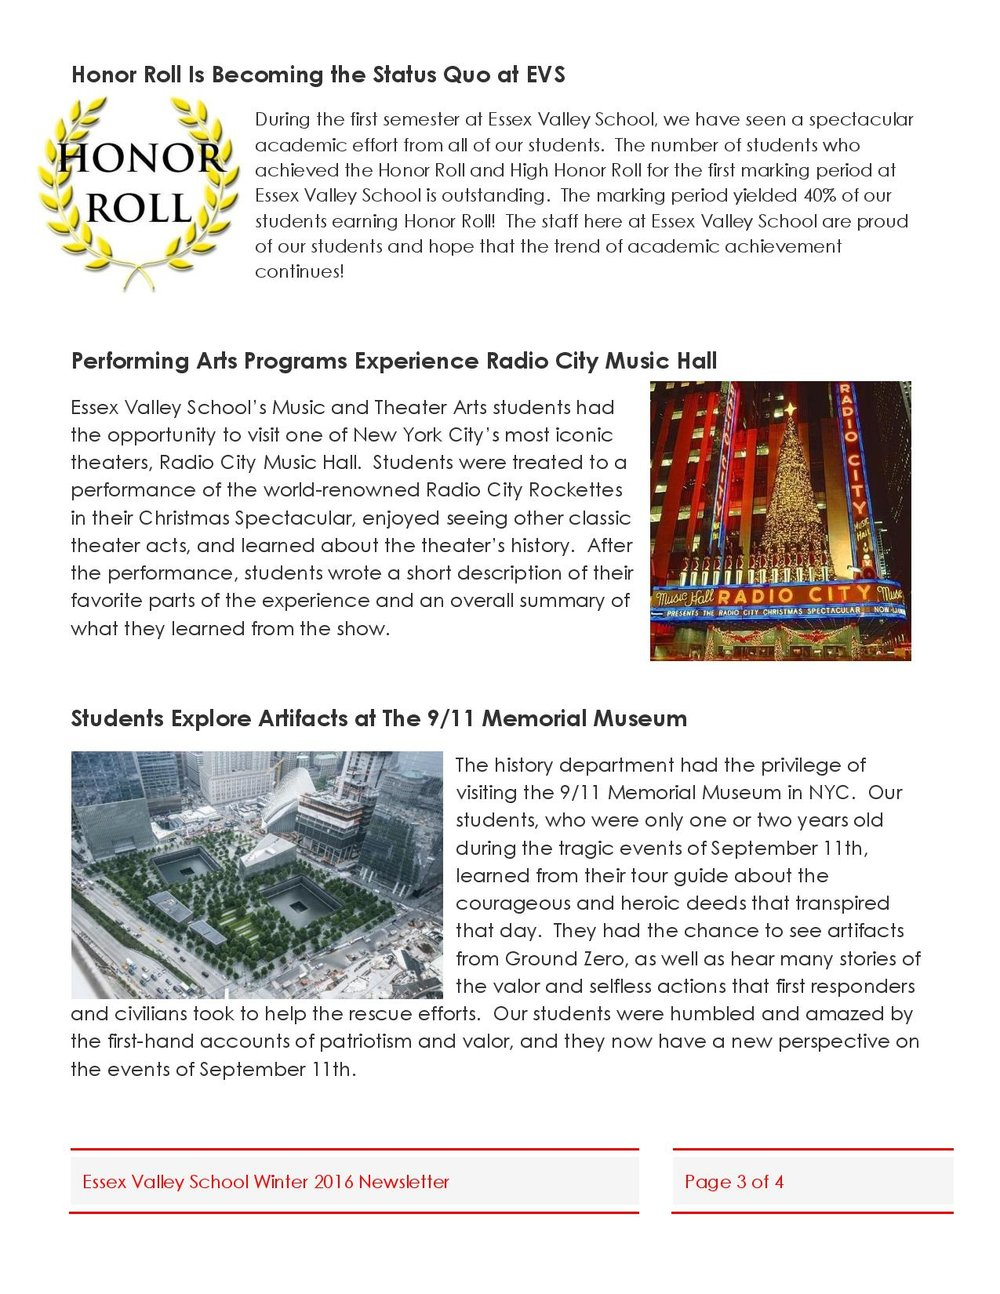 Winter Newsletter v2 (2)-page-004 (1).jpg